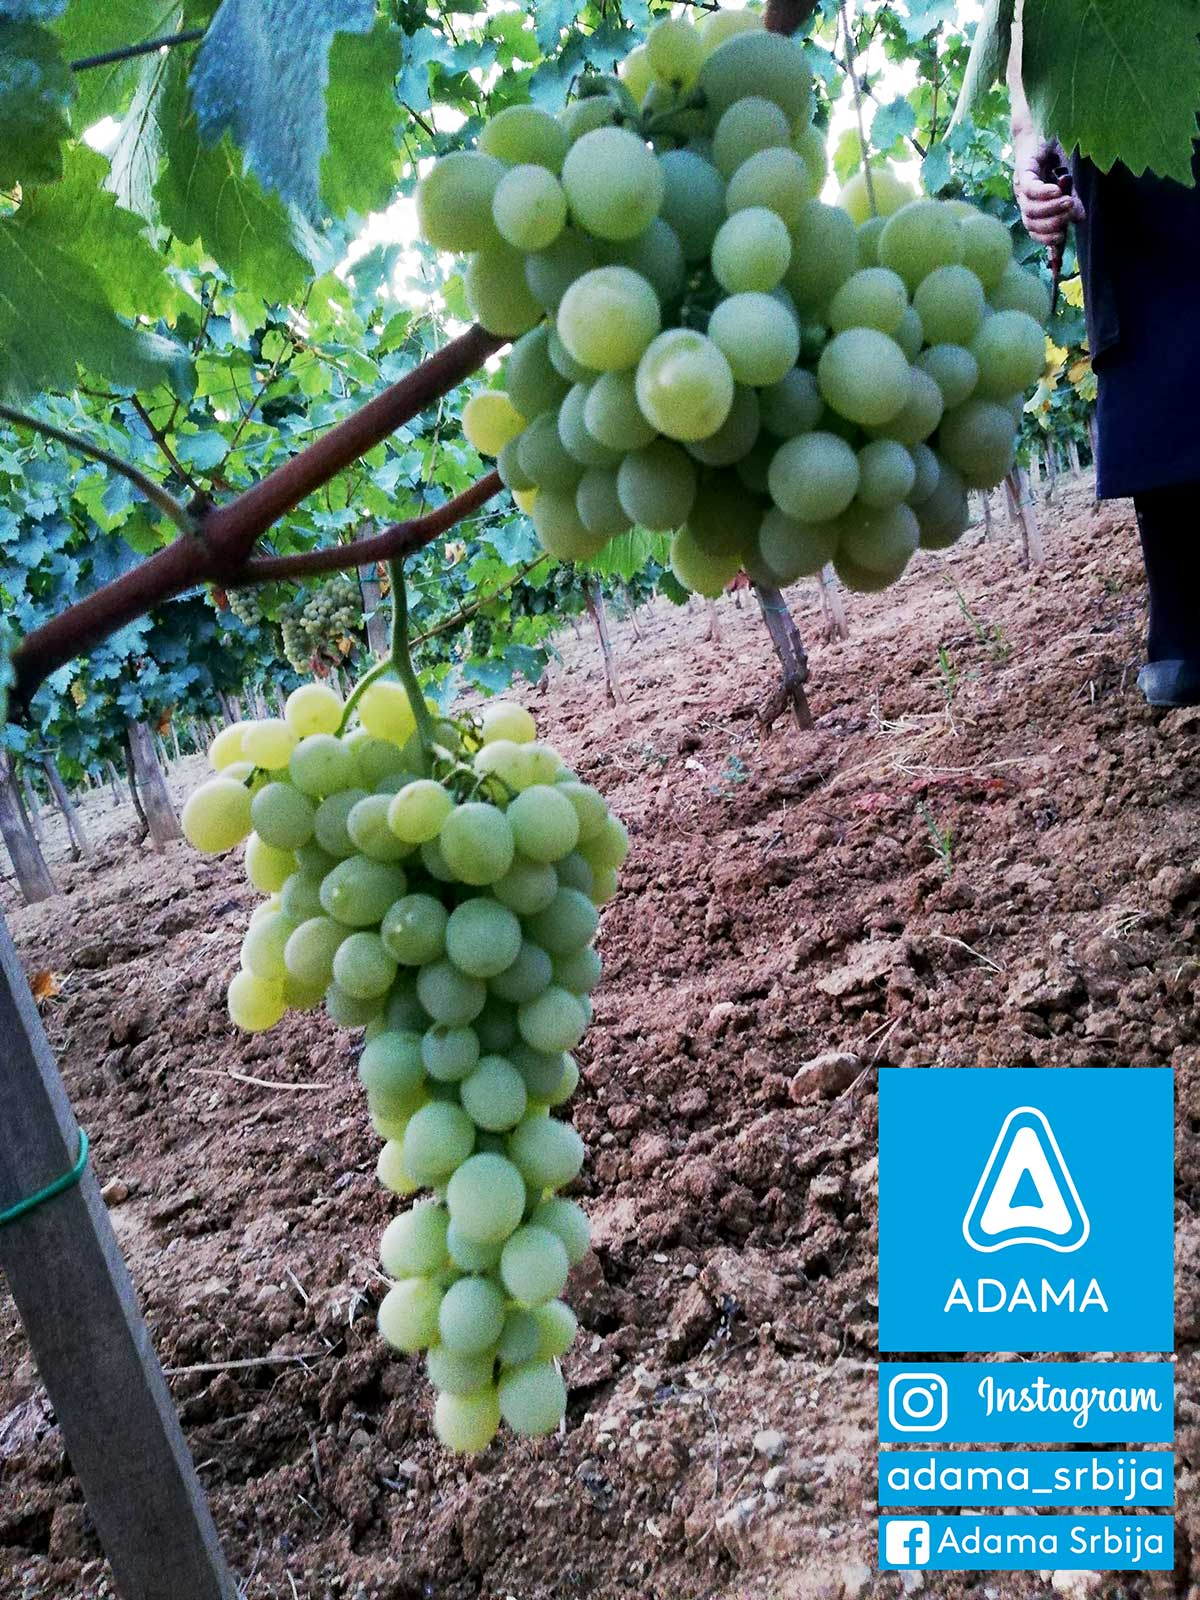 Agrosaveti---Adama---Vinograd---Grozdje---Vino---Drenca---Marko-Vukosavljevic---Fotkaj-plod-i-uvecaj-rod---Konkurs-05